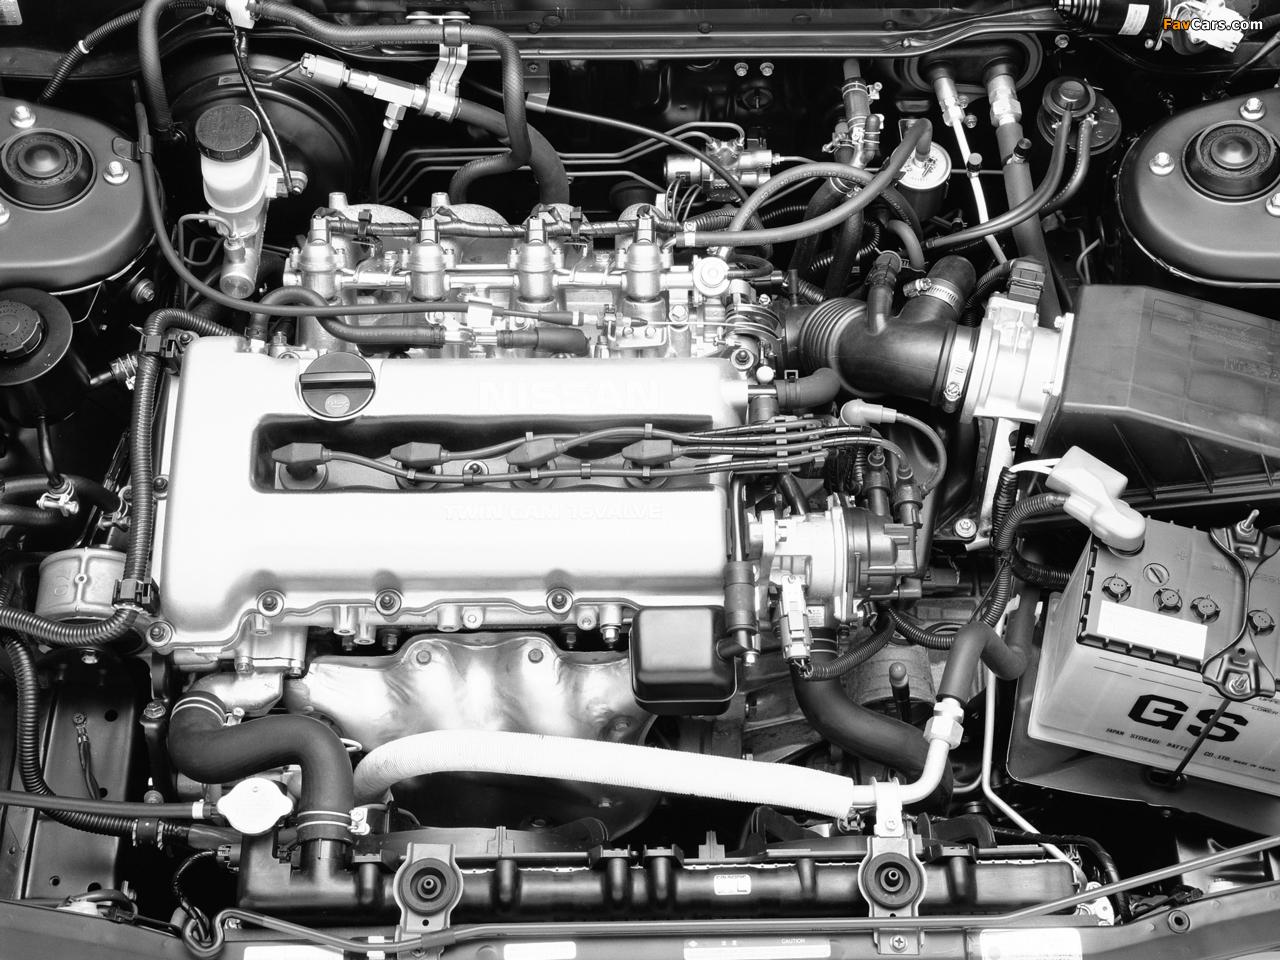 Nissan Avenir Salut 2.0 X GT Turbo (E-PNW10) 1995–96 photos (1280 x 960)